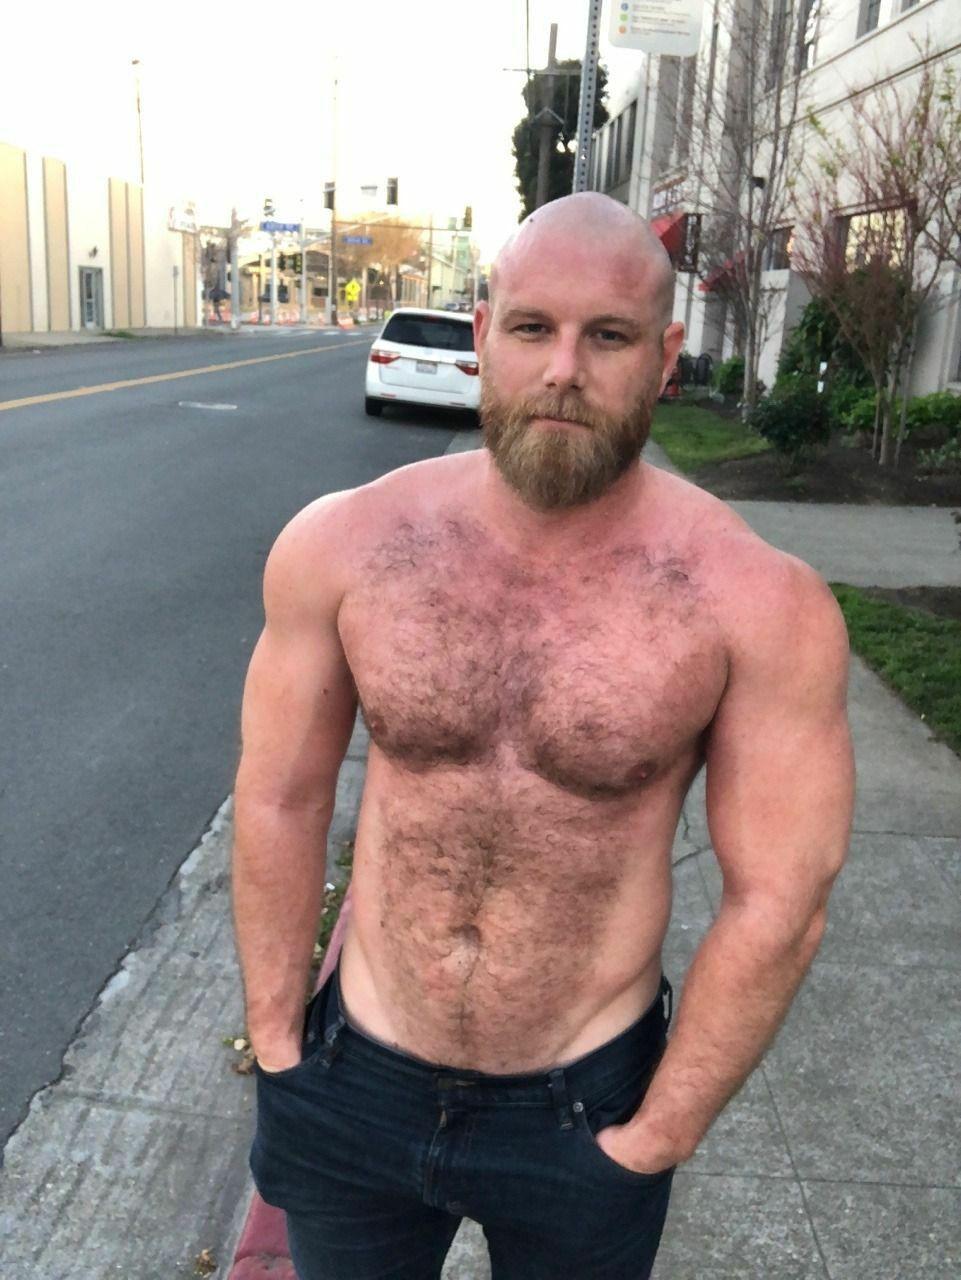 Pin On Hair And Beard Styles